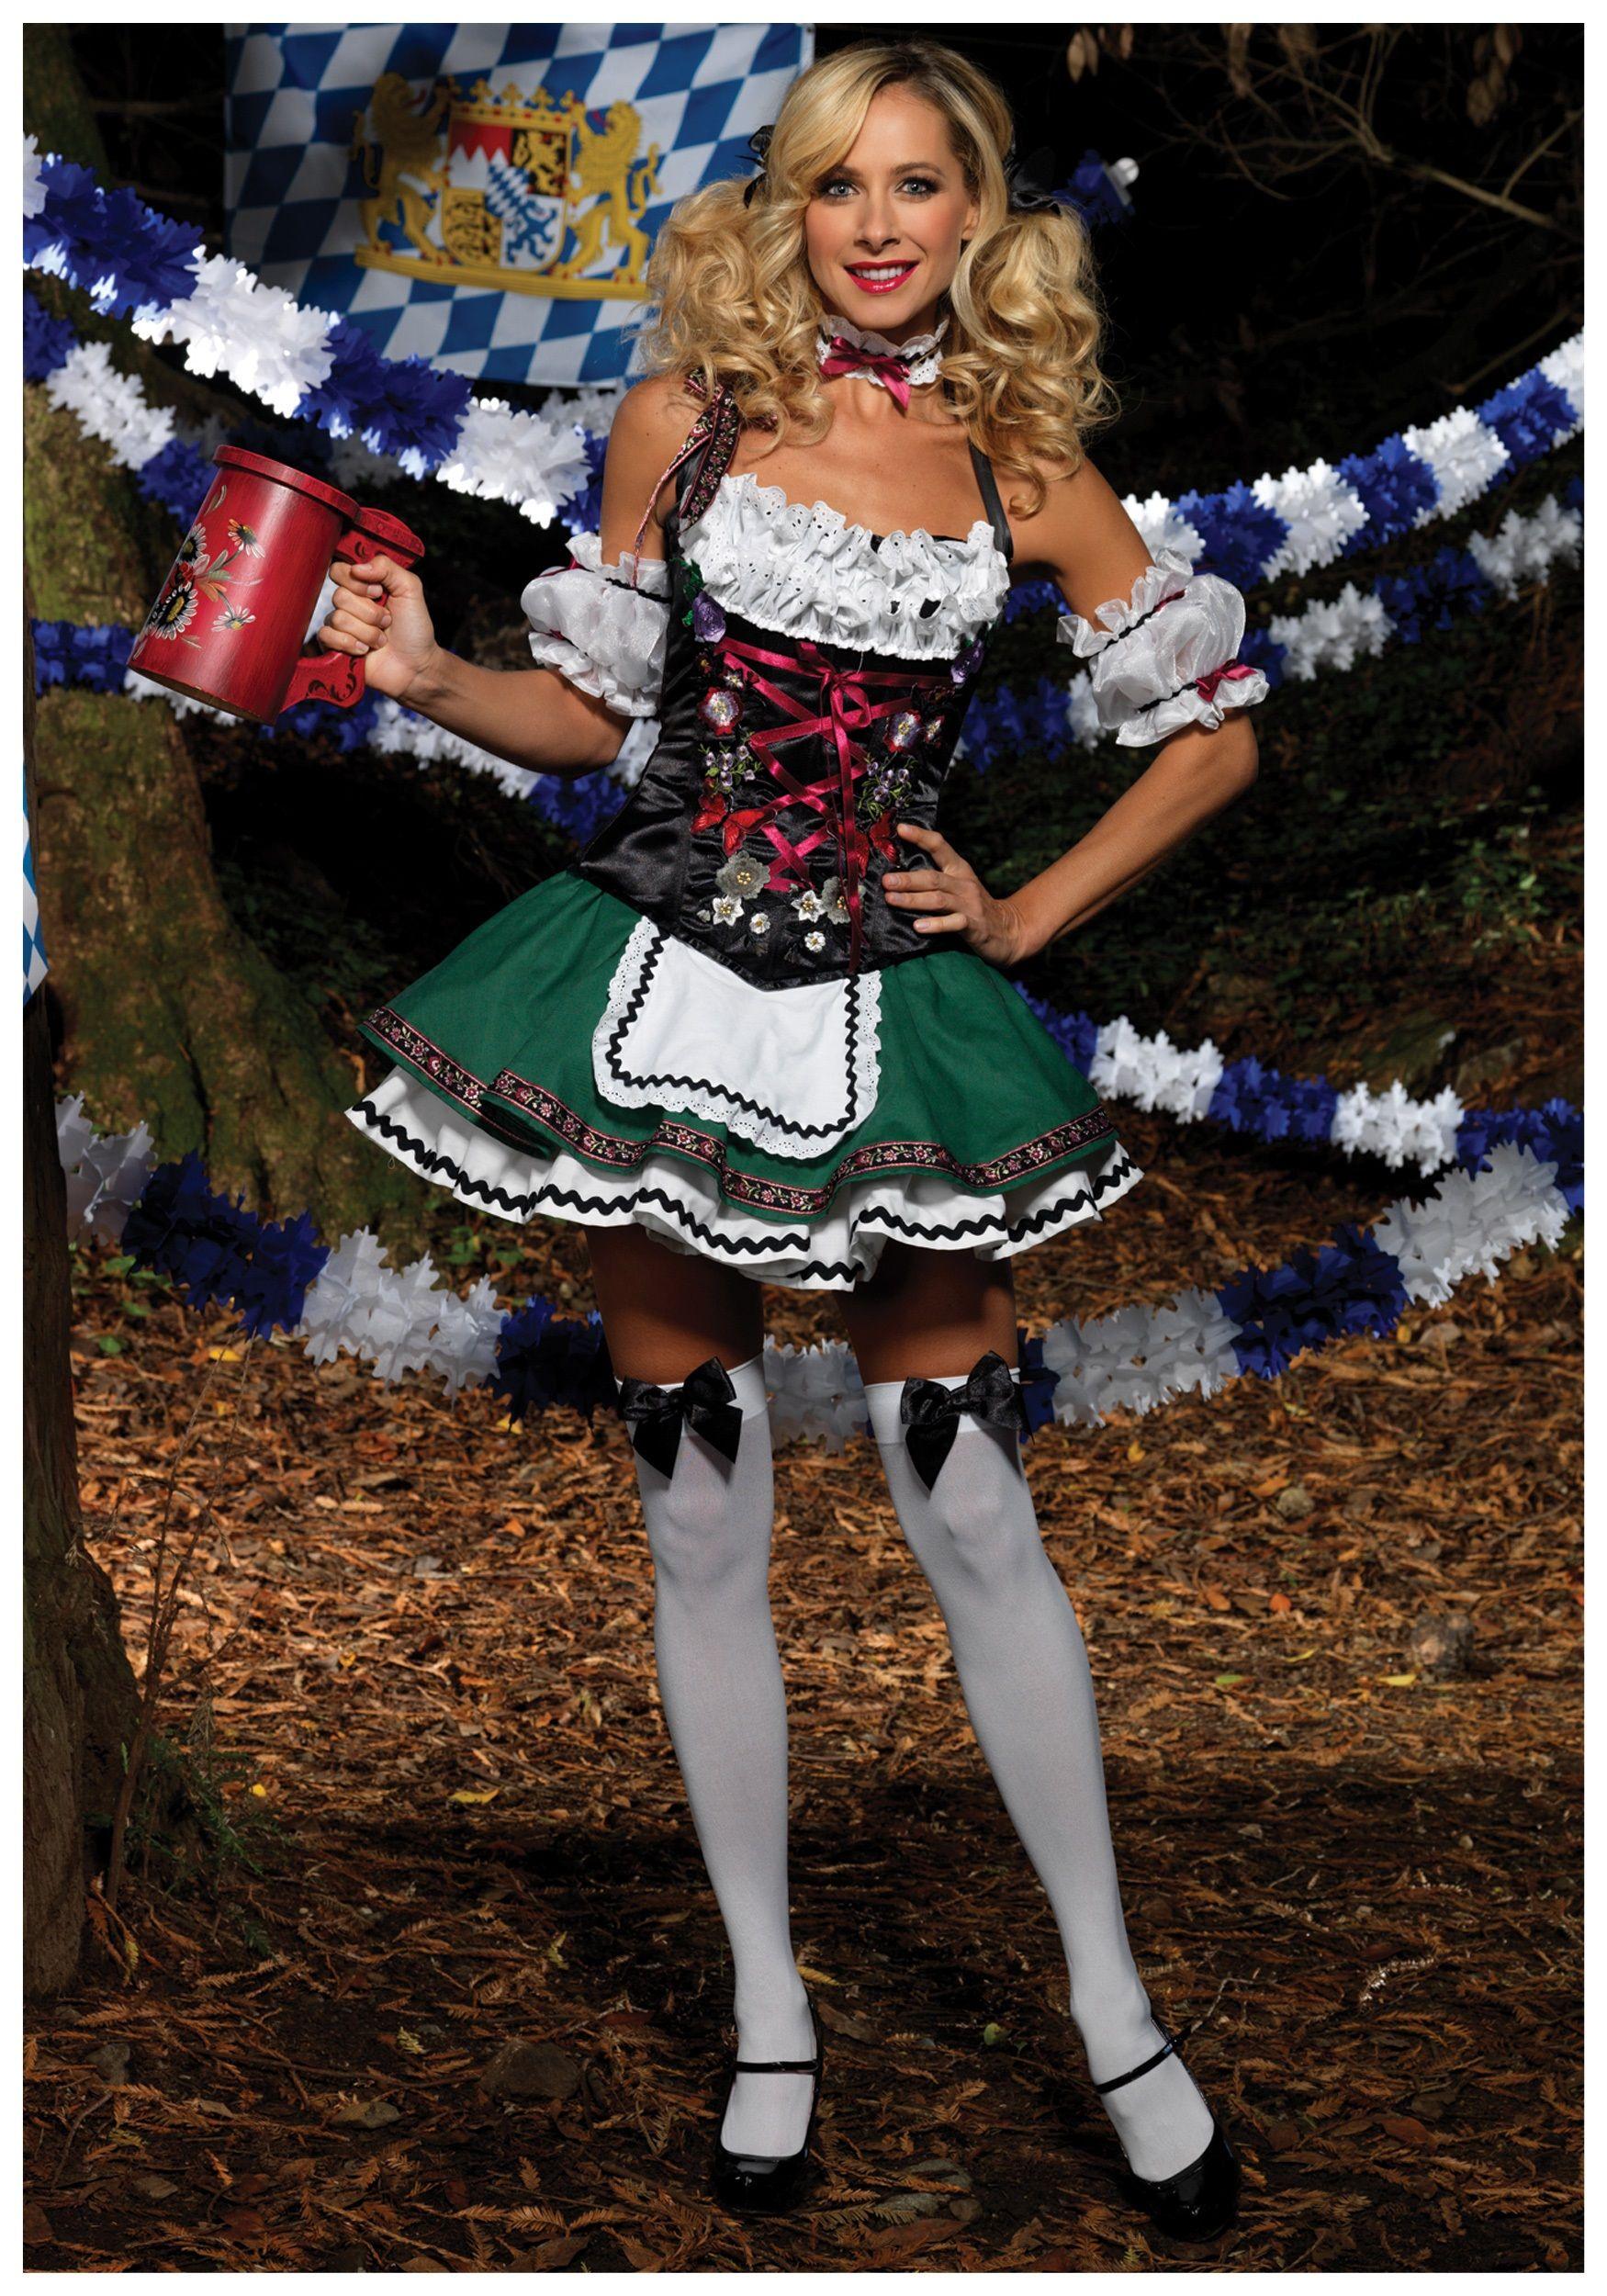 b1a0b8ba03f2e stereotypical german woman - Google Search. stereotypical german woman -  Google Search Beer Girl Halloween Costume